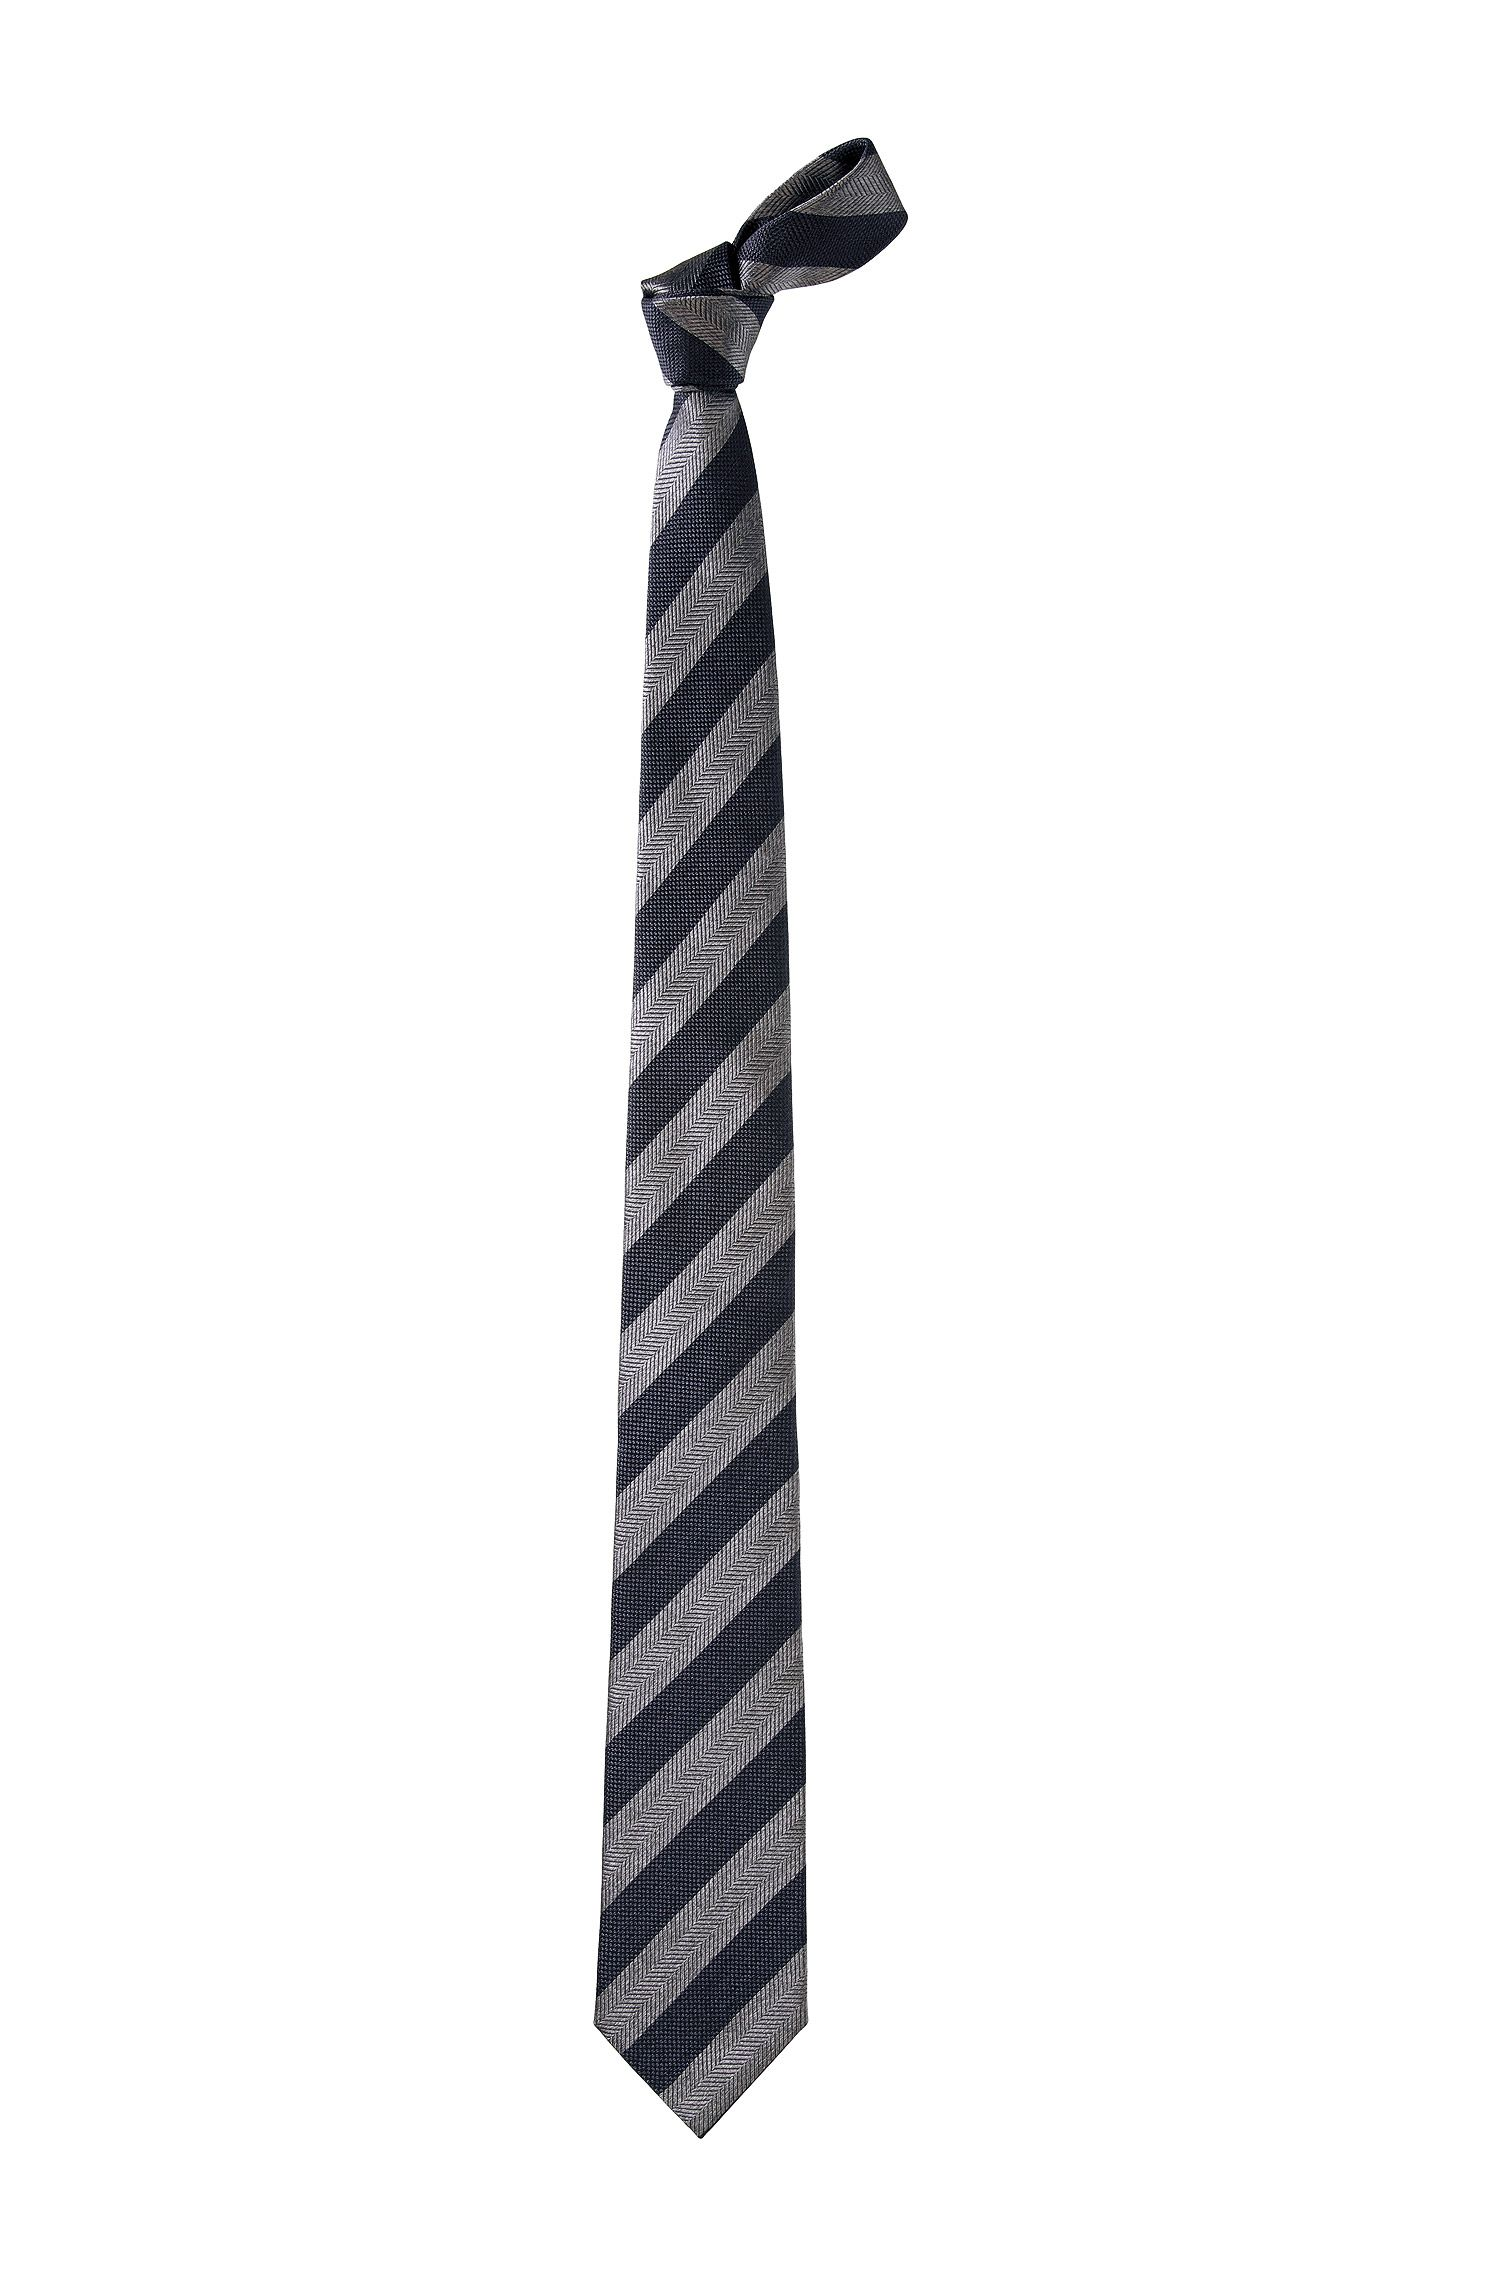 Krawatte ´Tie 7,5 cm` aus Seide